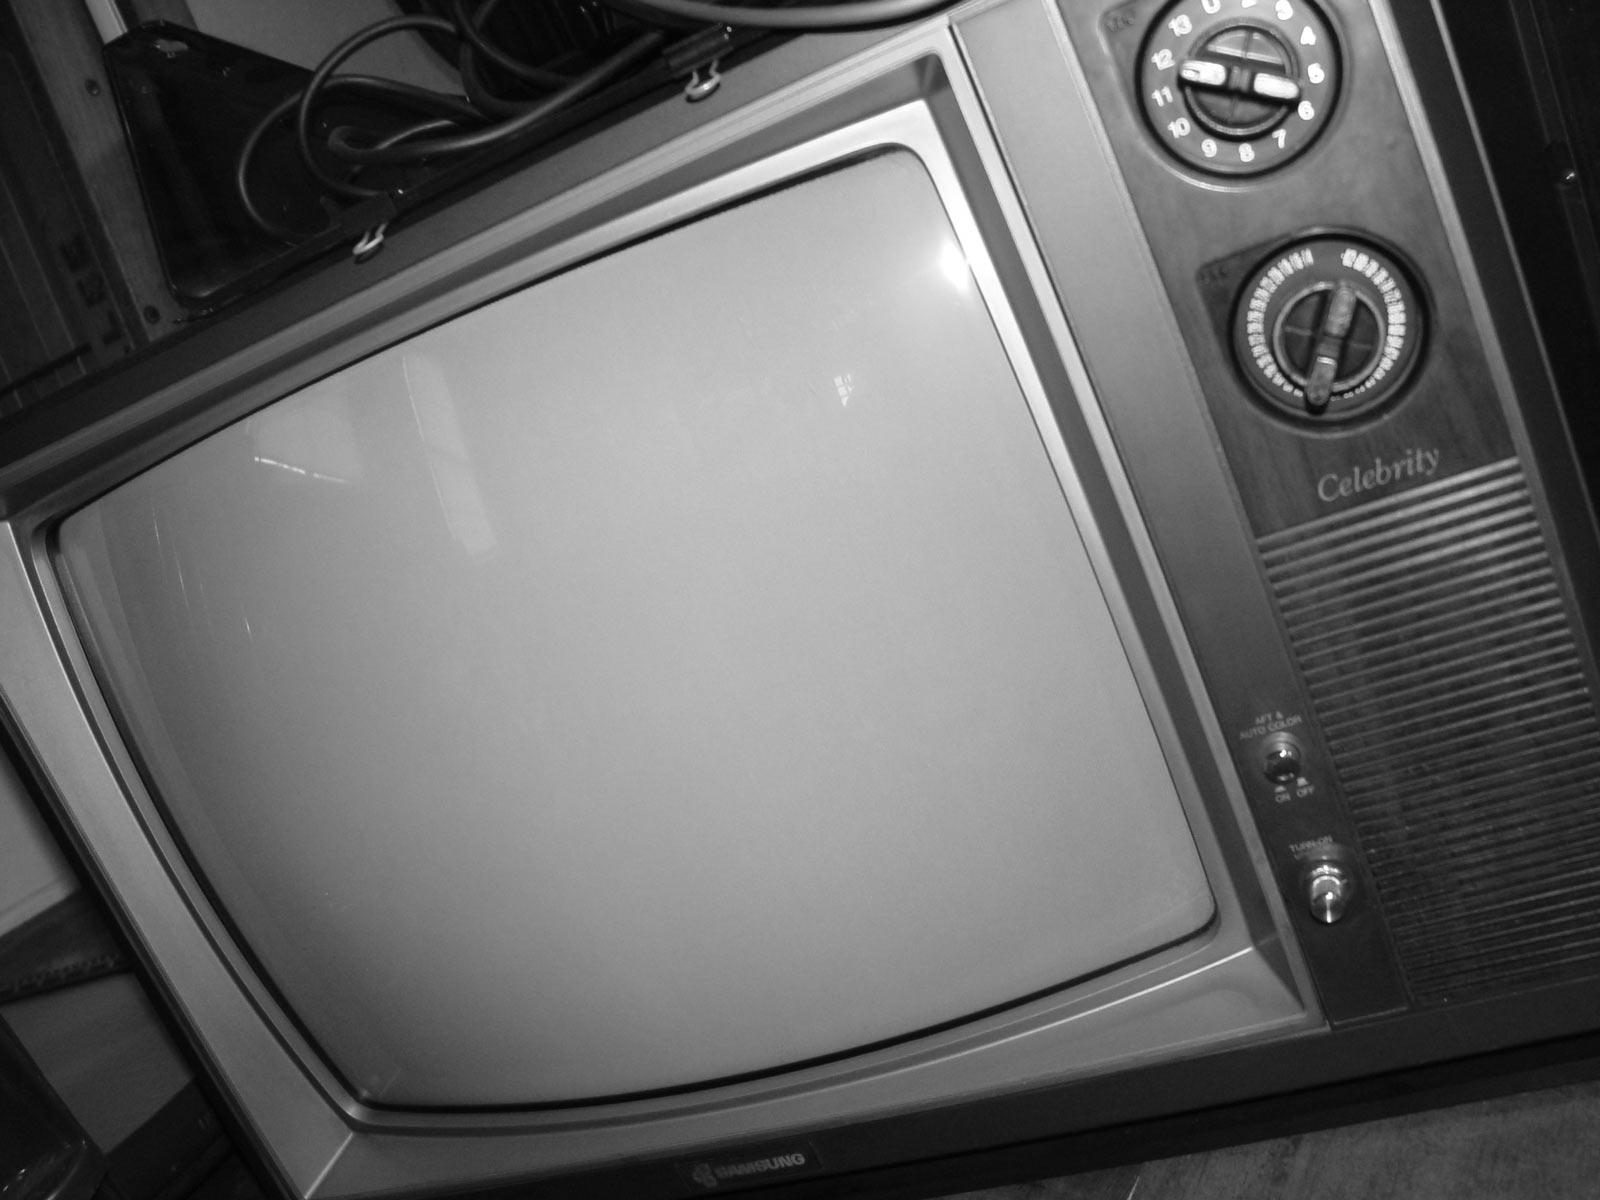 Old Television, Blackandwhite, Electronics, Monitor, Television, HQ Photo